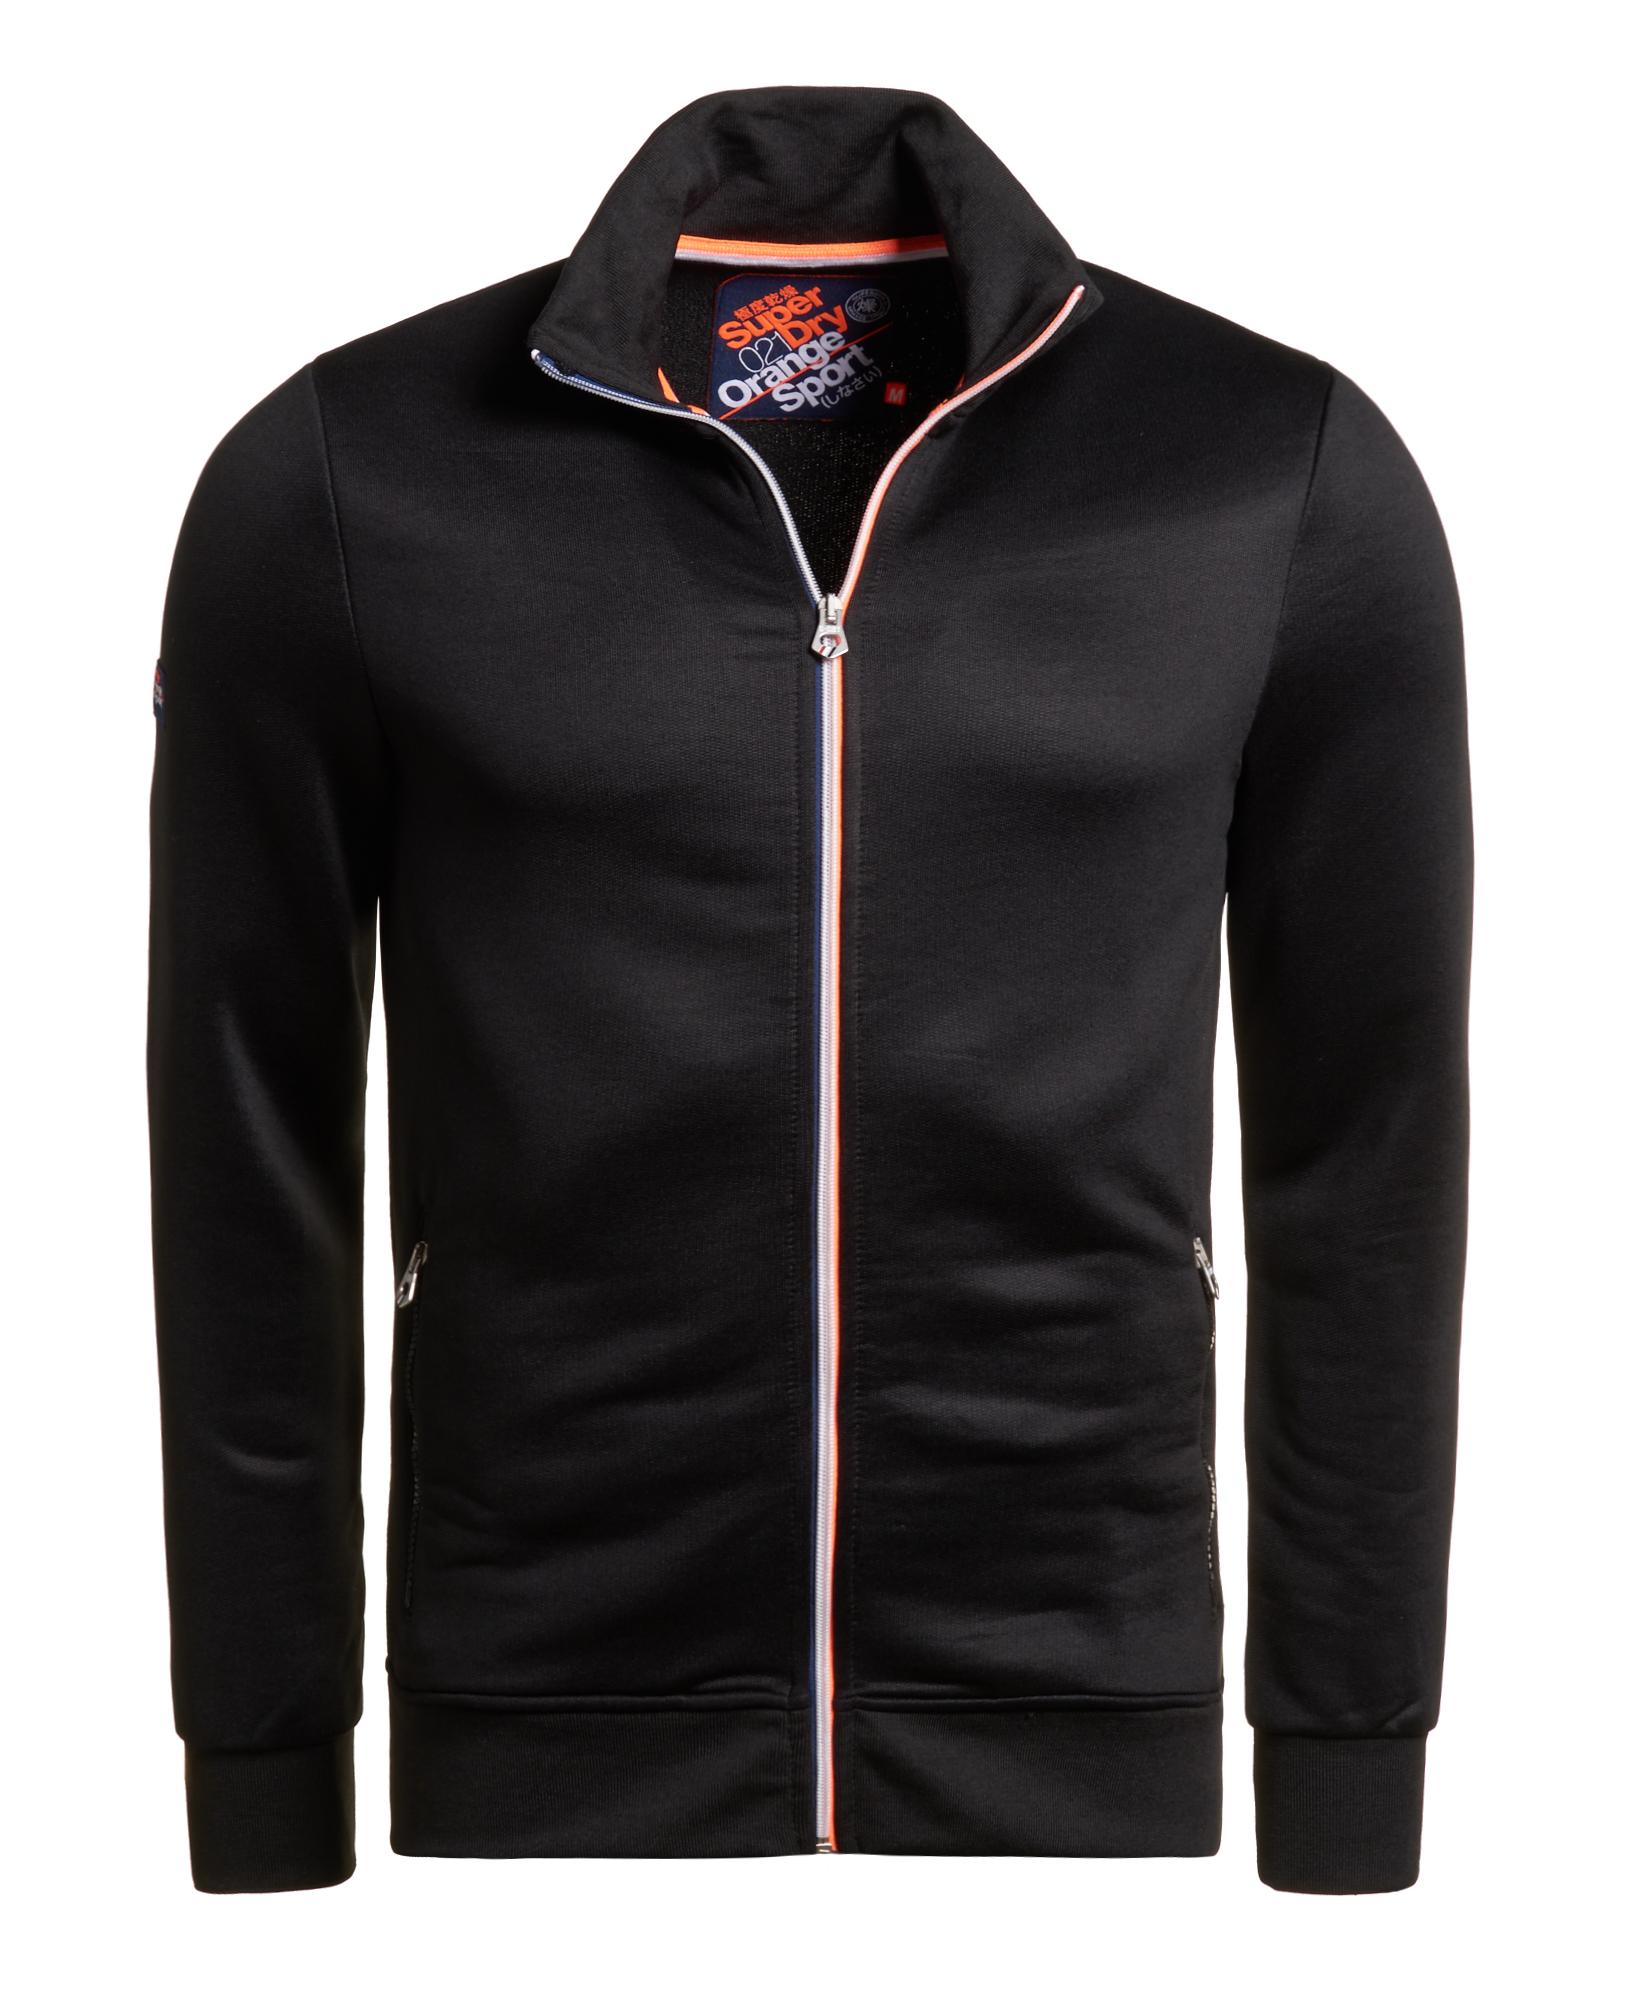 veste survetement adidas noir orange tag